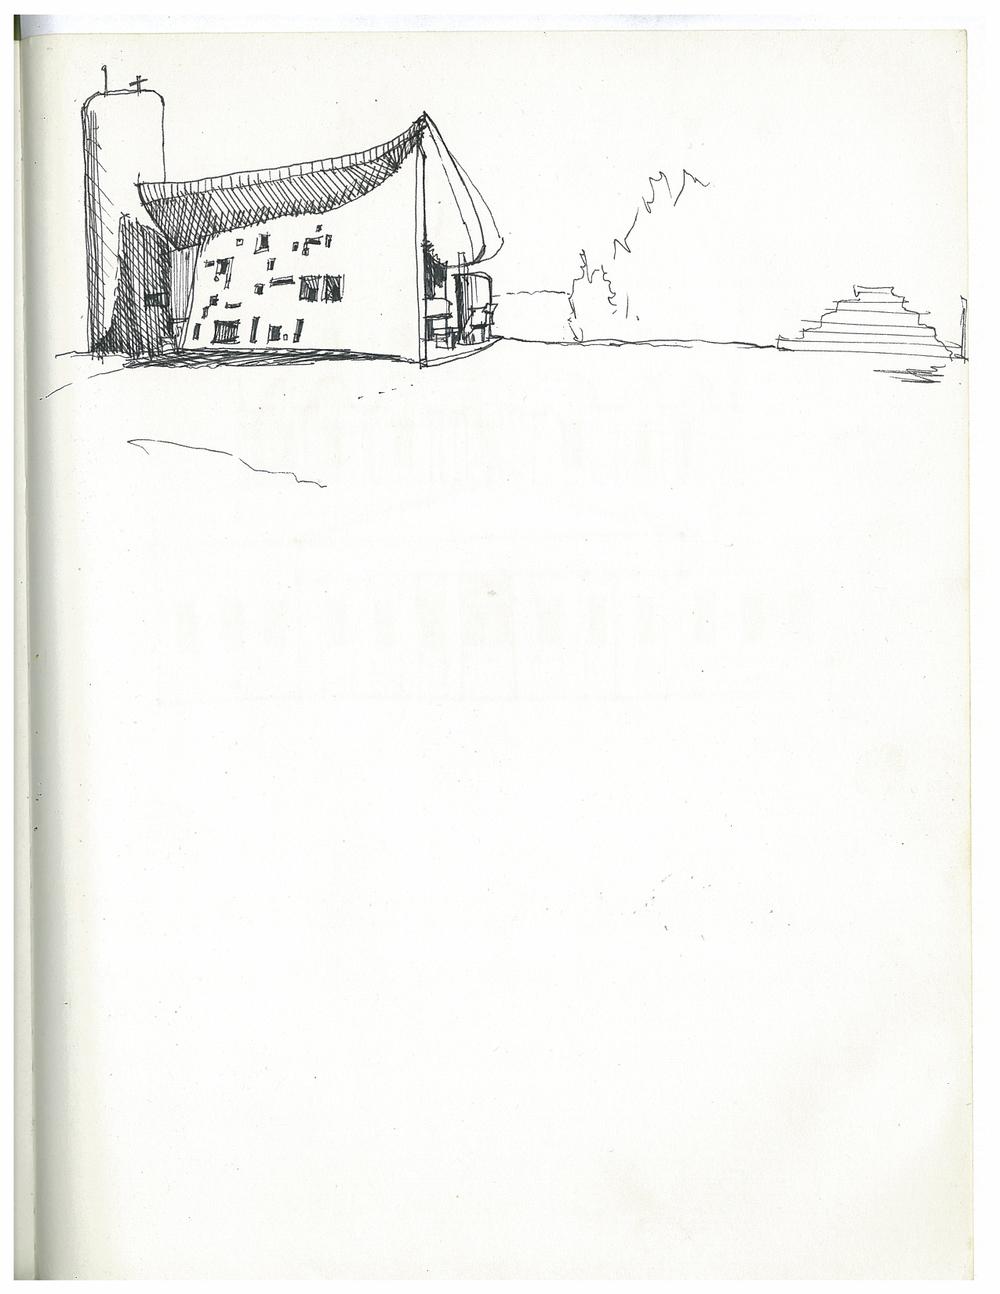 1980 - 71 Ronchamp.jpg